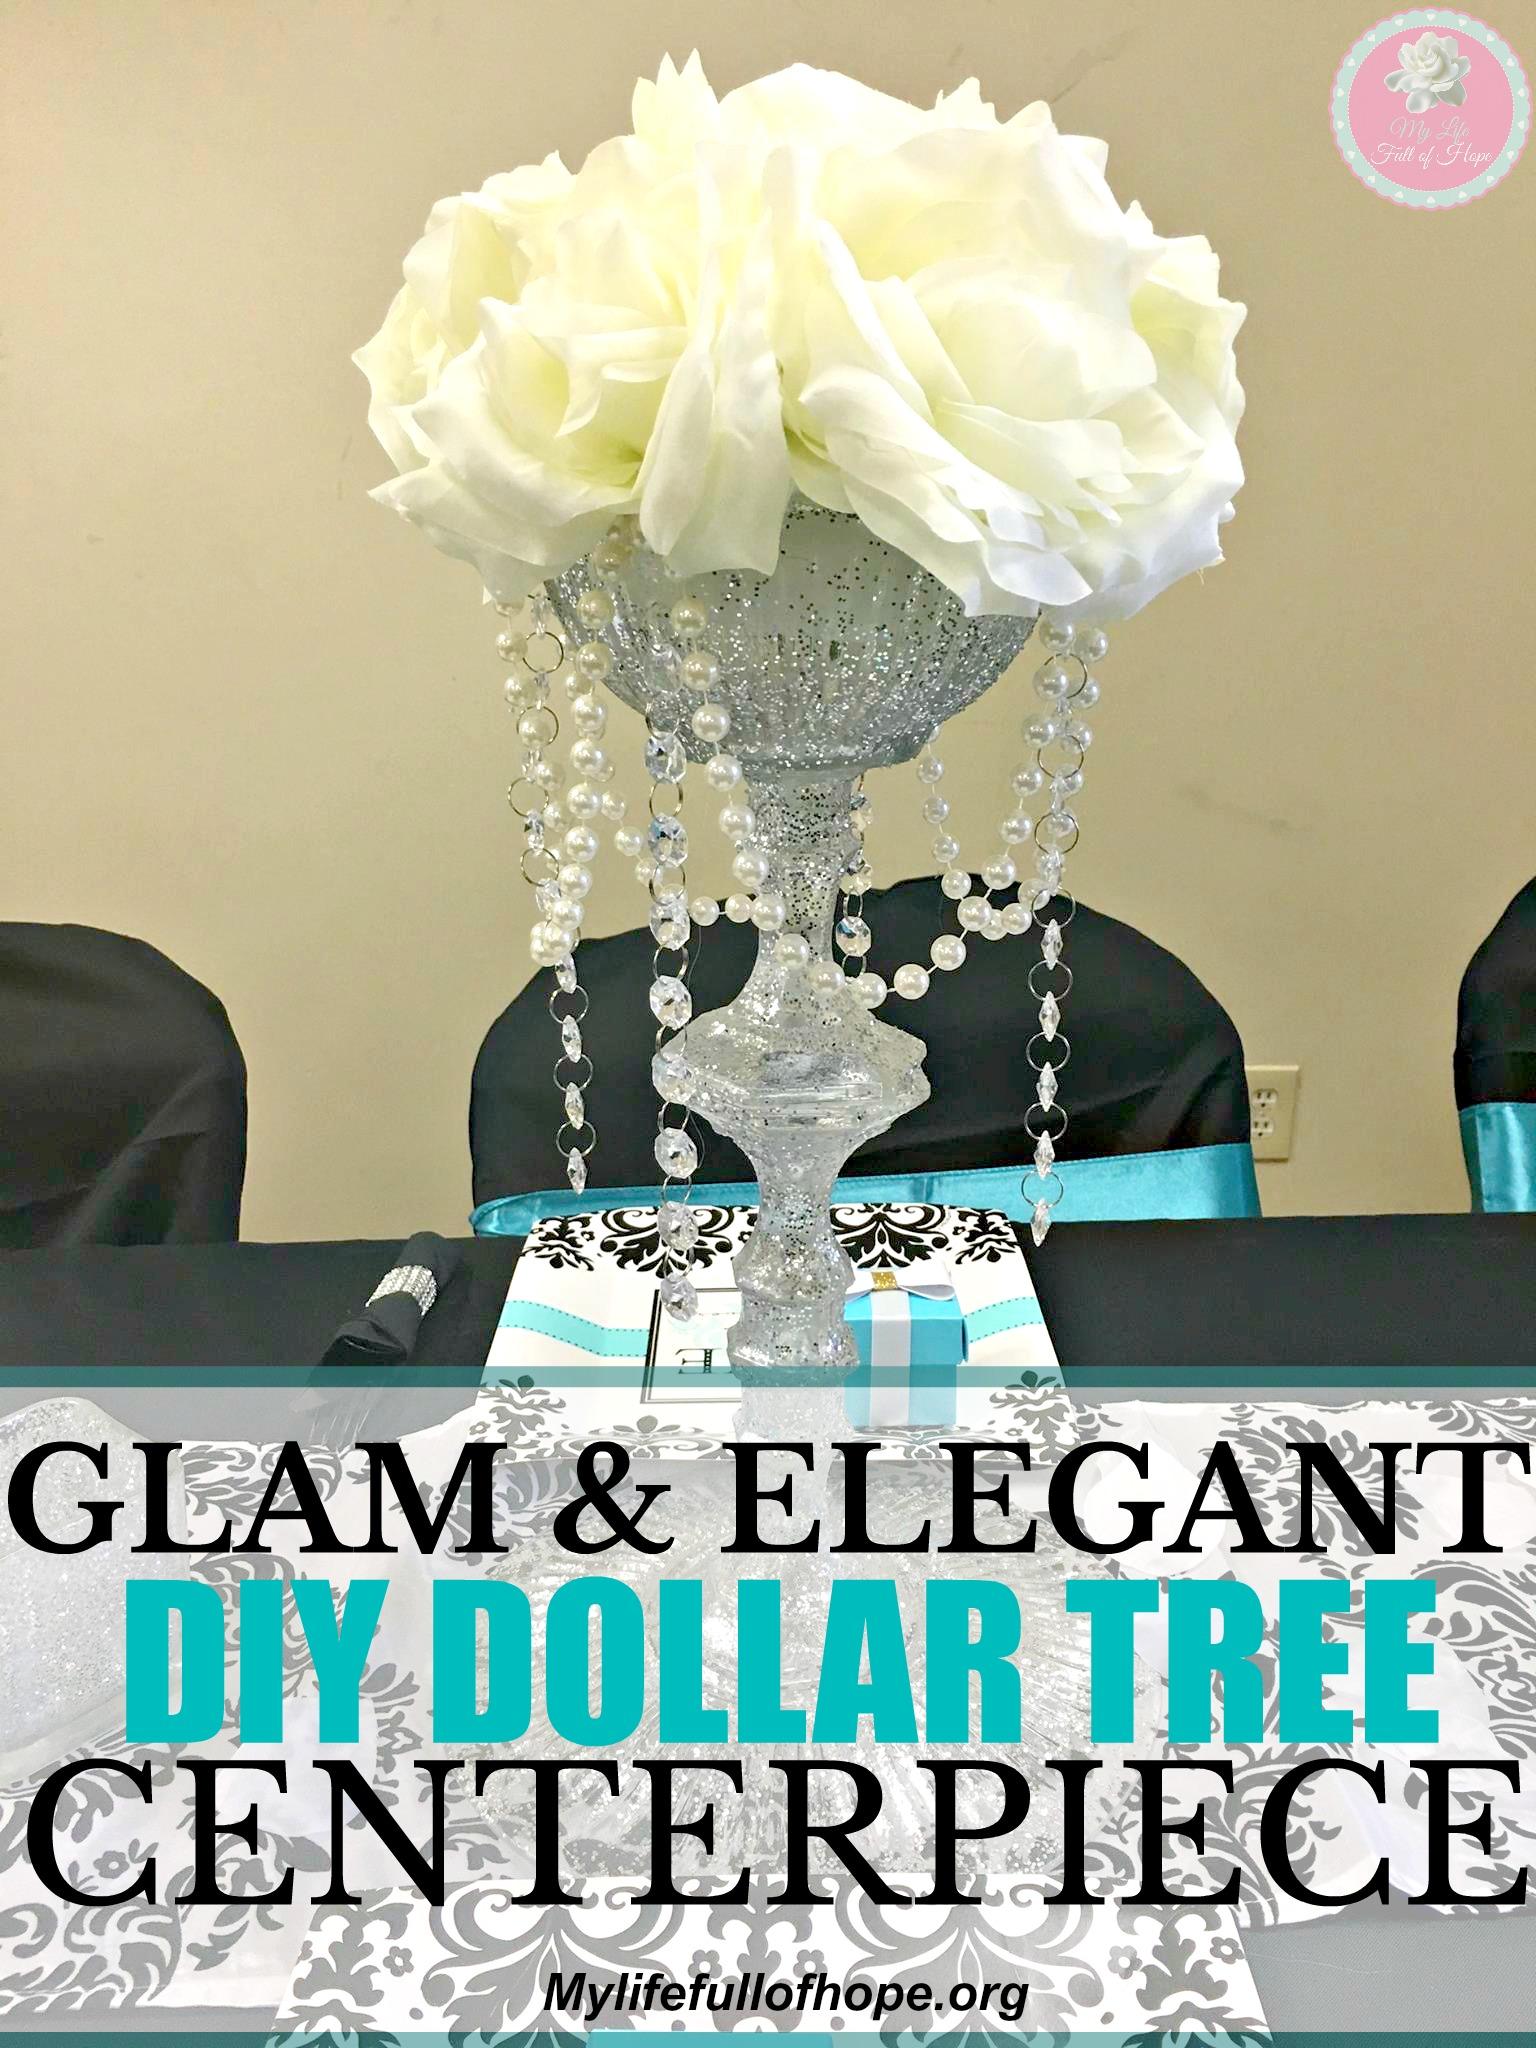 6c848e74c62 Glam Elegant Dollar Tree Centerpiece Weddings anniversary bridal shower